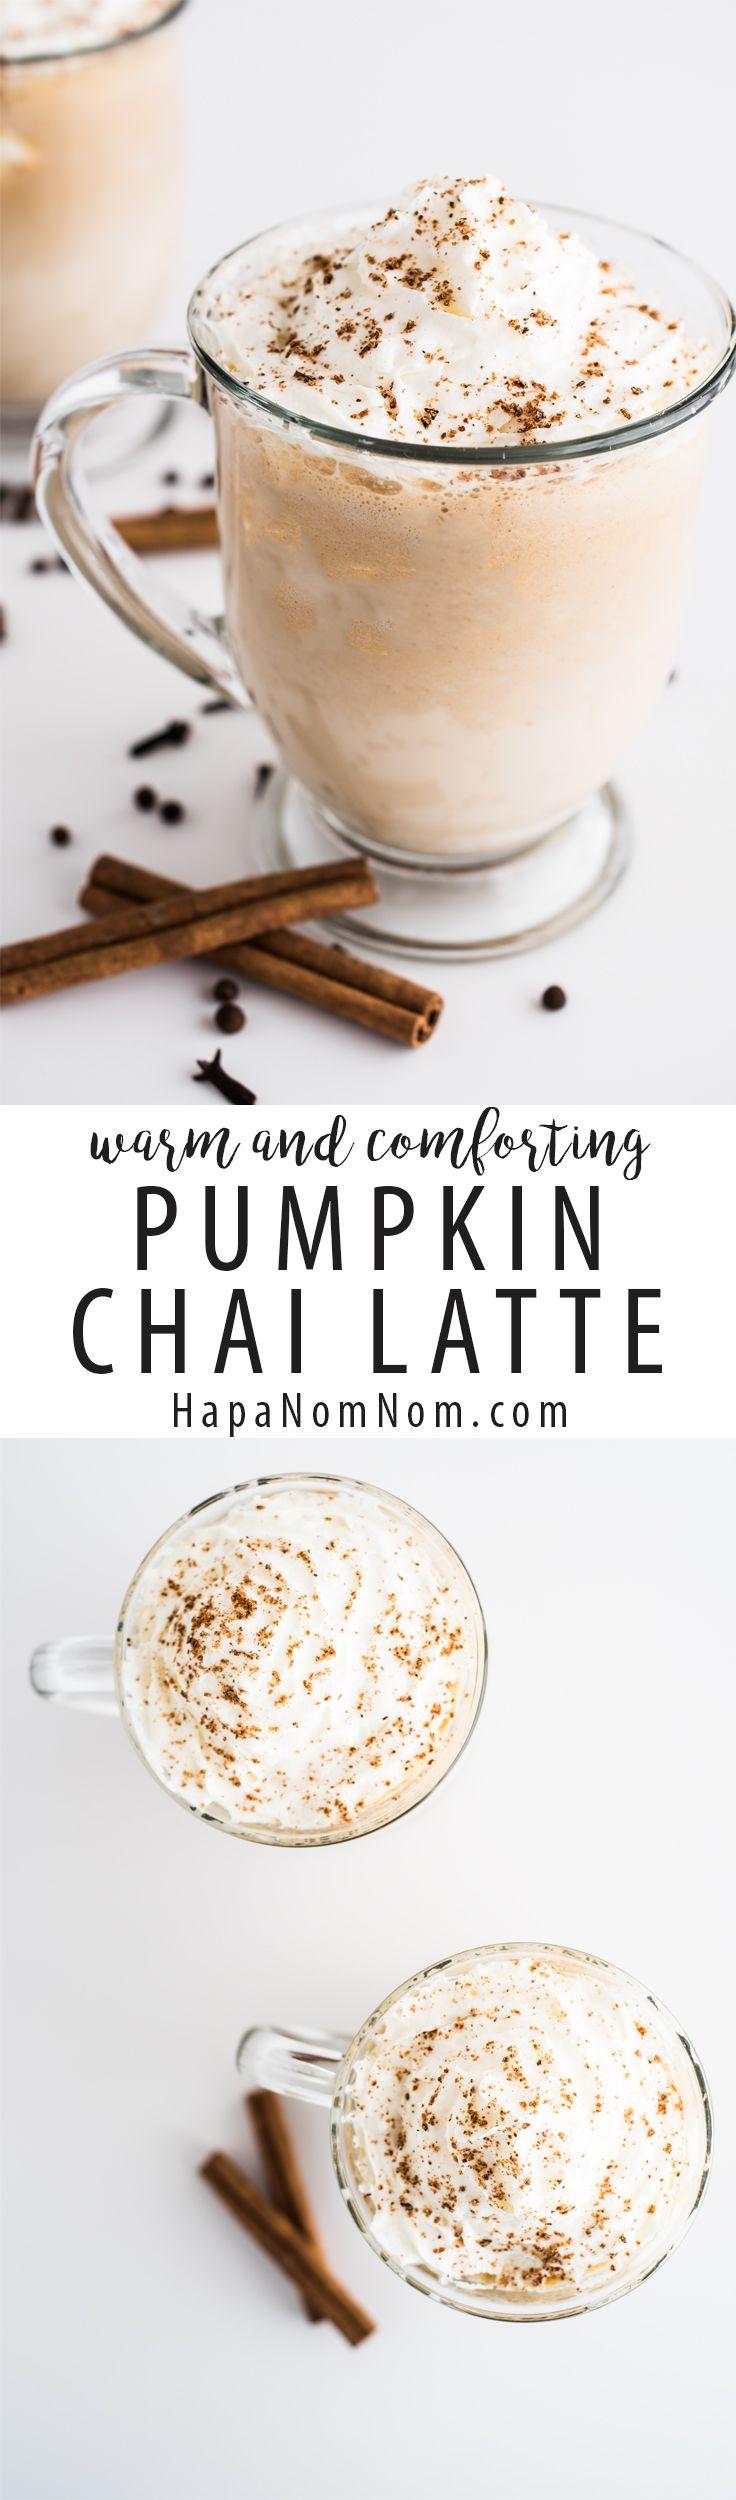 Warm and Comforting Pumpkin Chai Latte